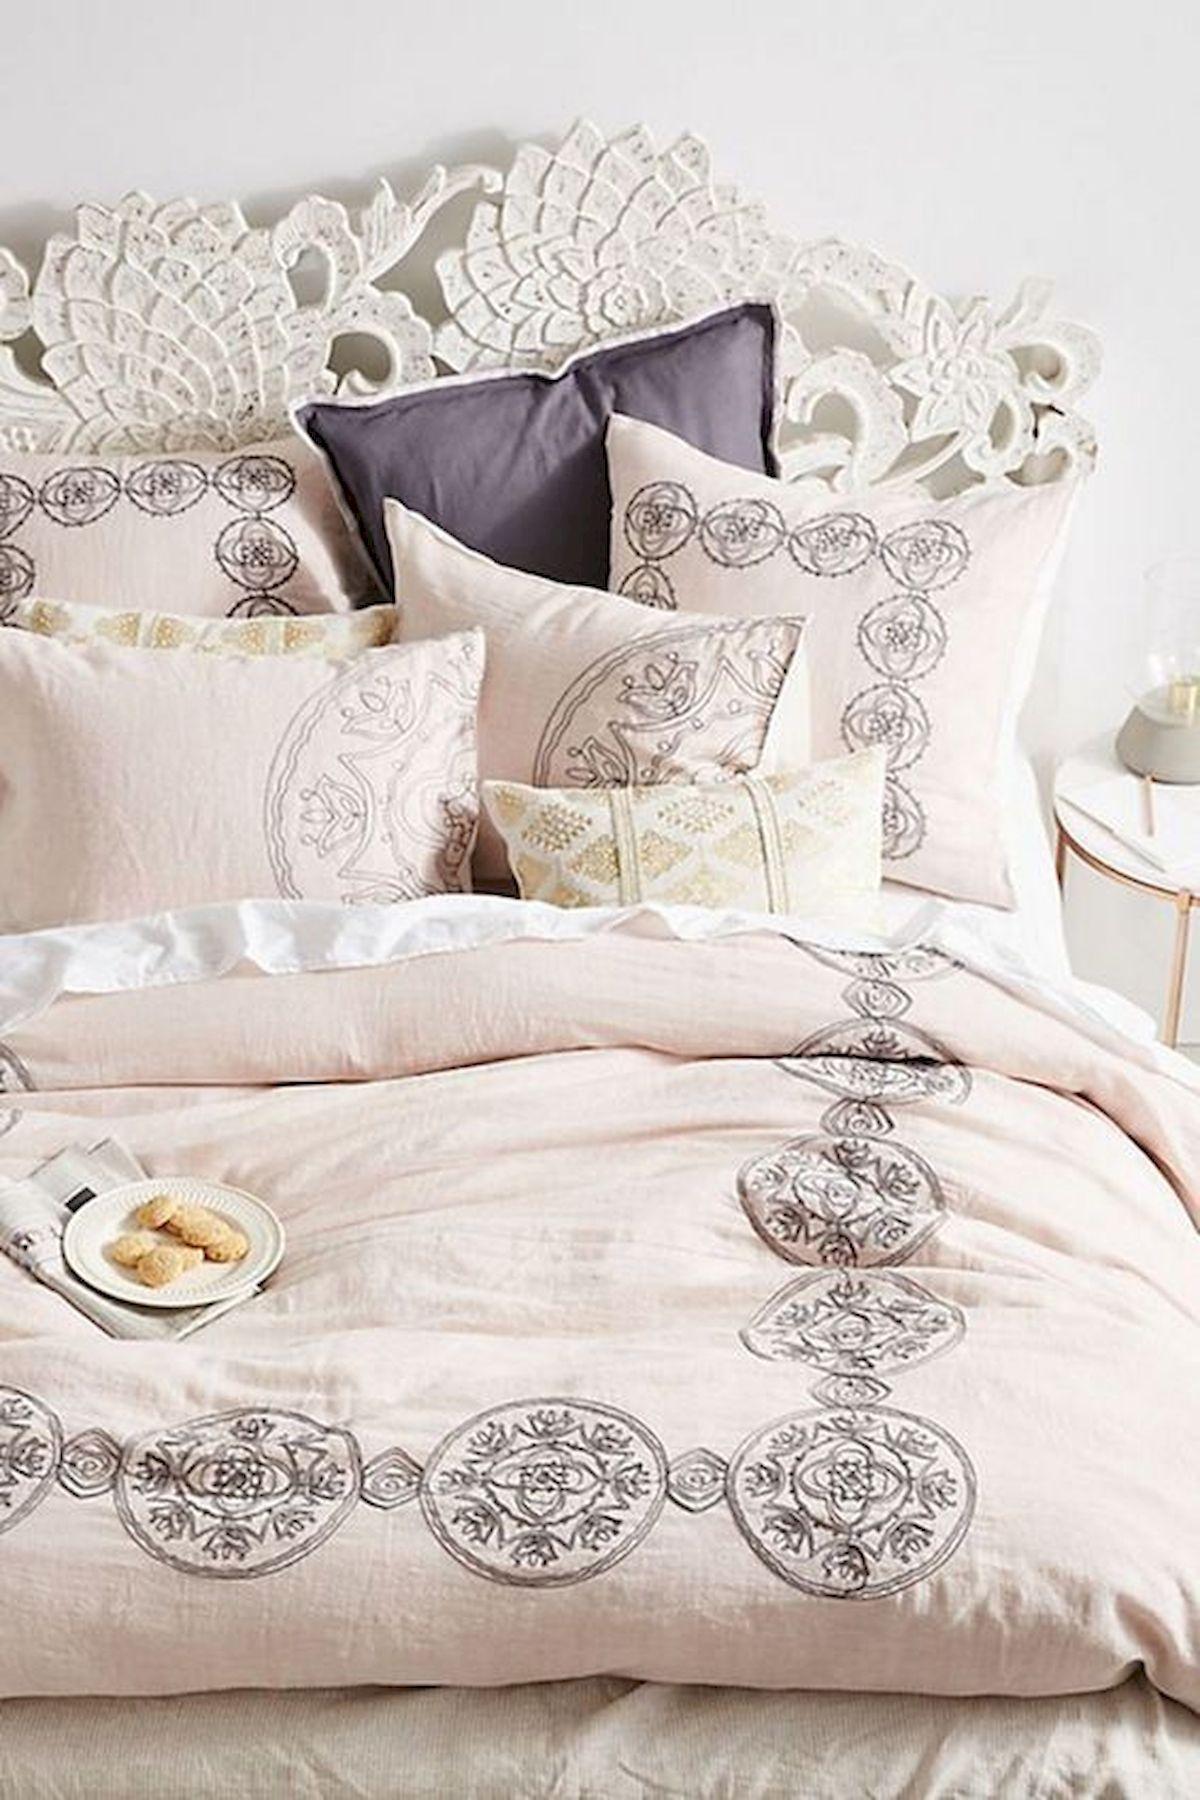 40 Fantastic DIY Decor Ideas For Farmhouse Boho Bedroom Design (29)